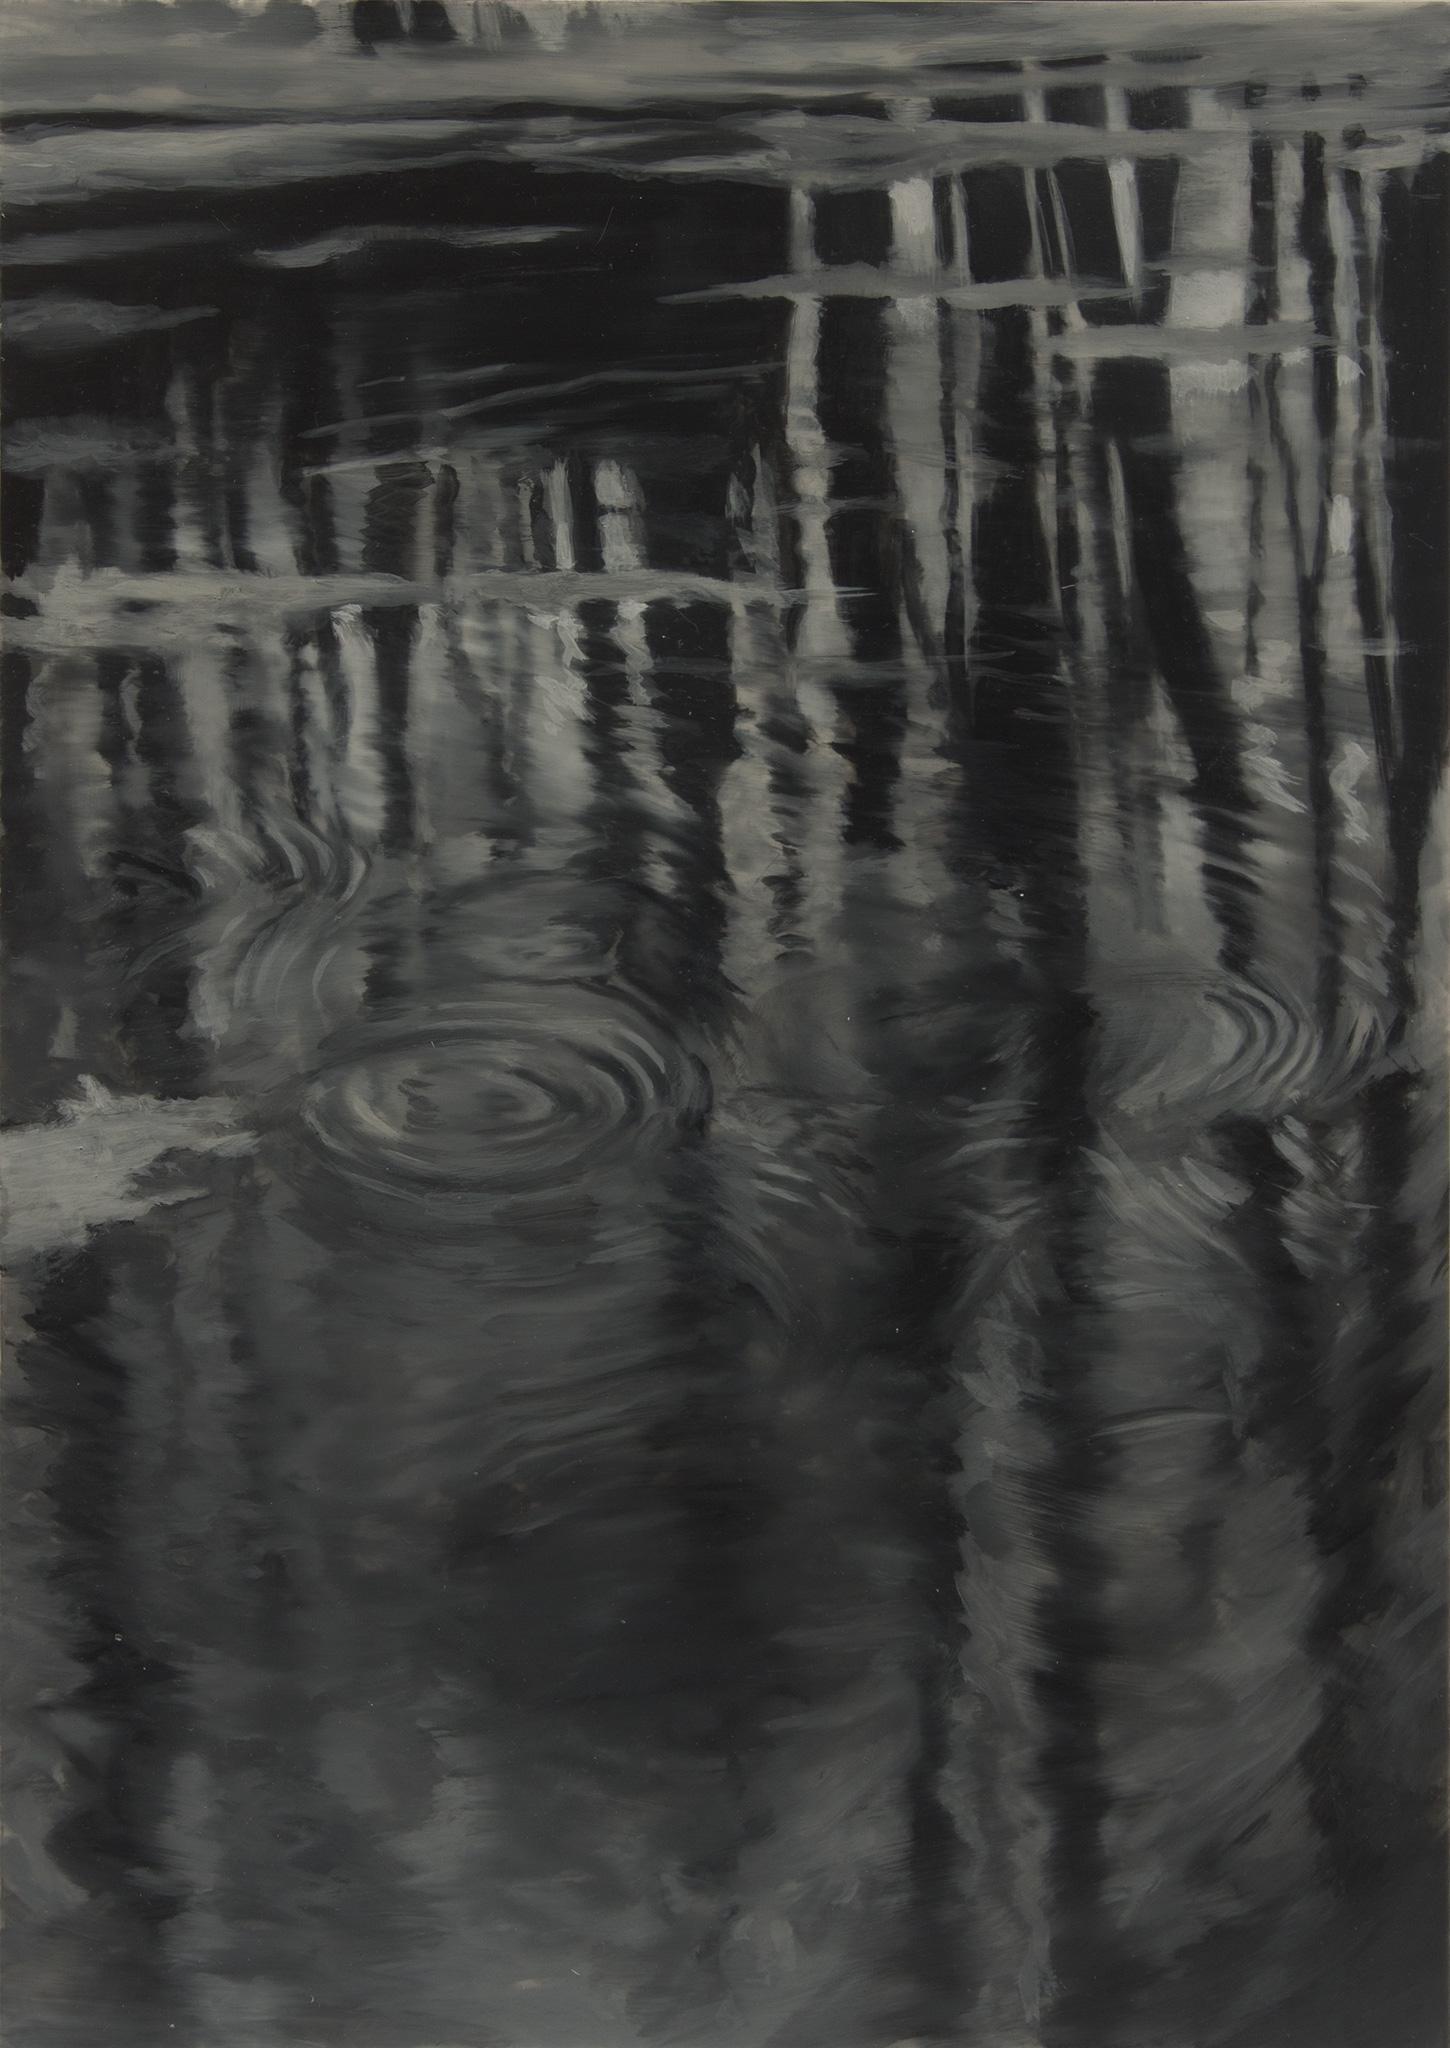 Poema I Óleo sobre poliéster 29,5 x 21 cm 2019